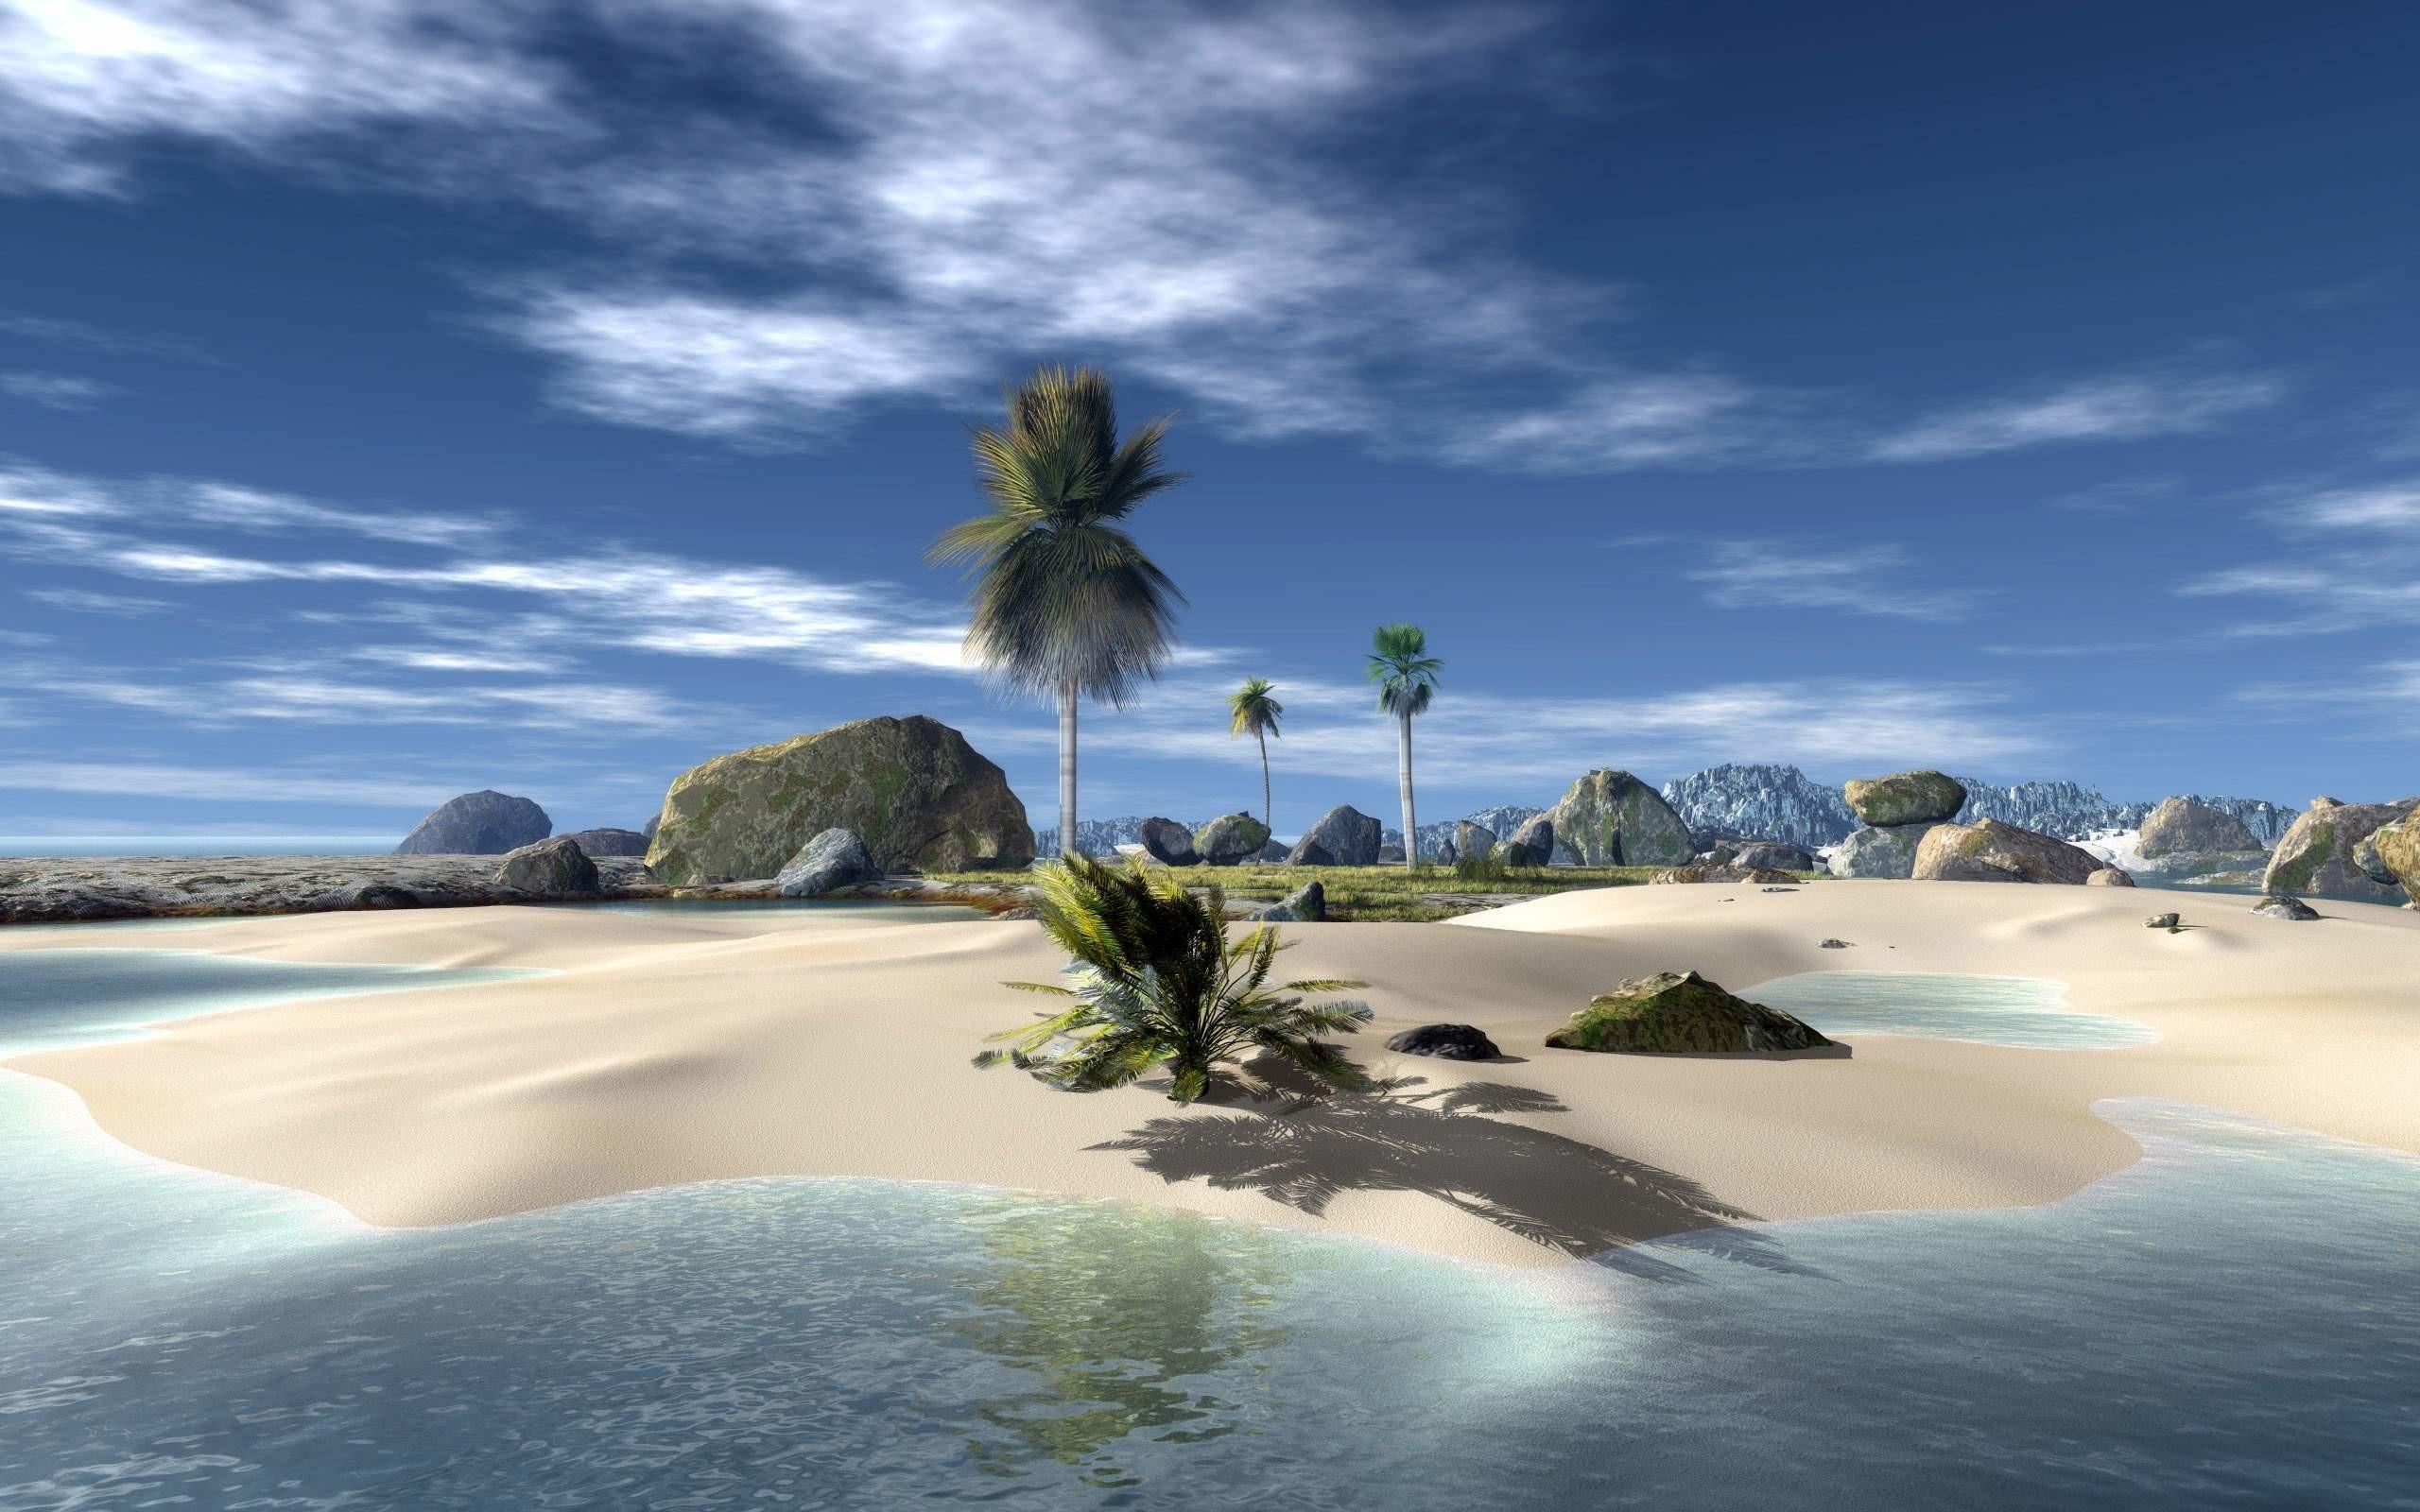 Desktop Nature Backgrounds 64 Pictures